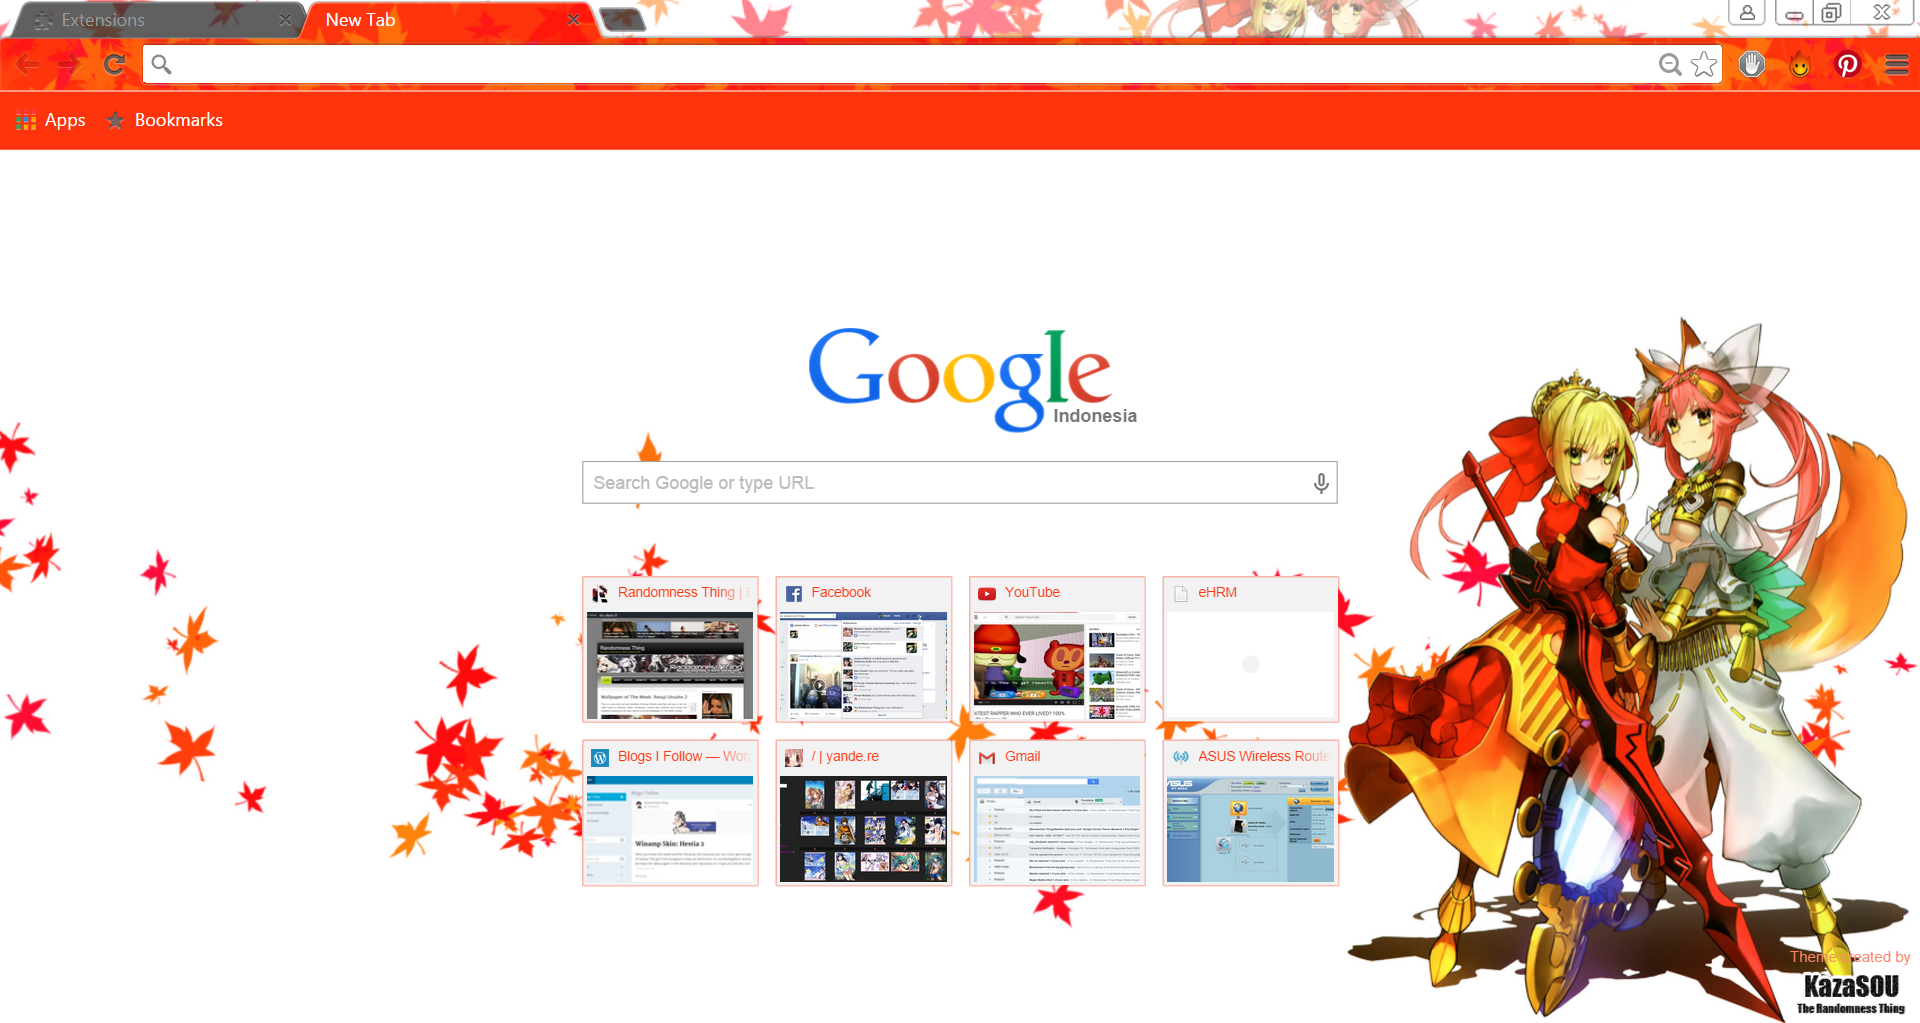 Google themes live - Saber_caster_chrome